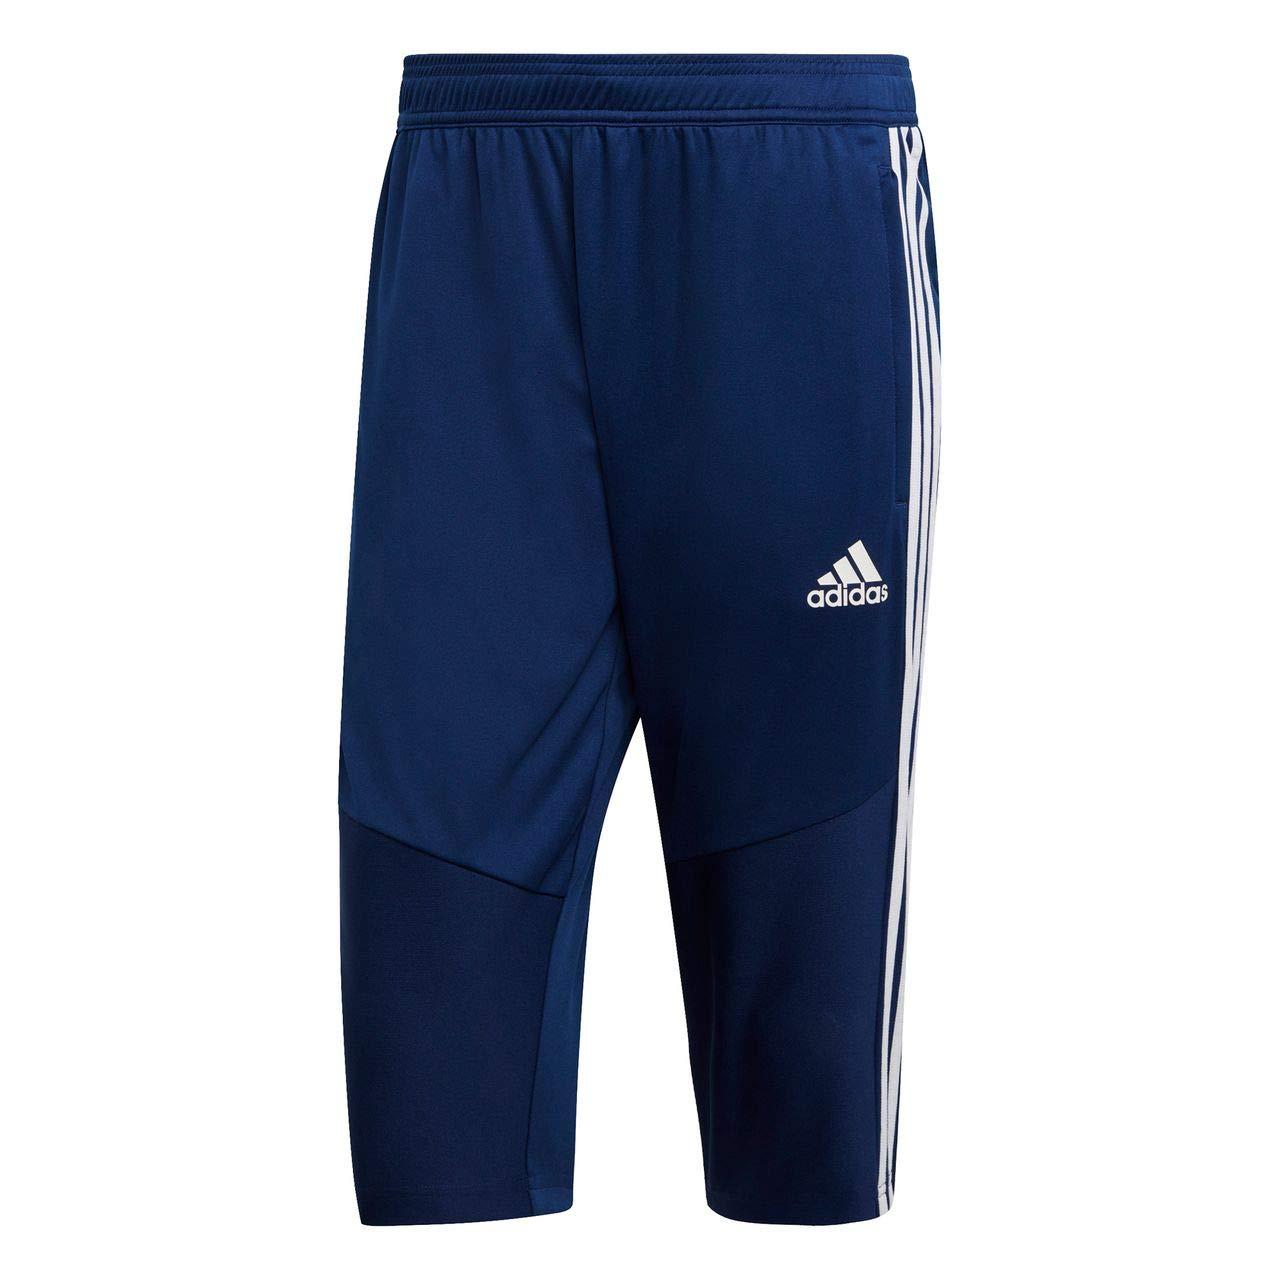 adidas DT5124 Pants, Hombre, Azul (Dark Blue/White), M